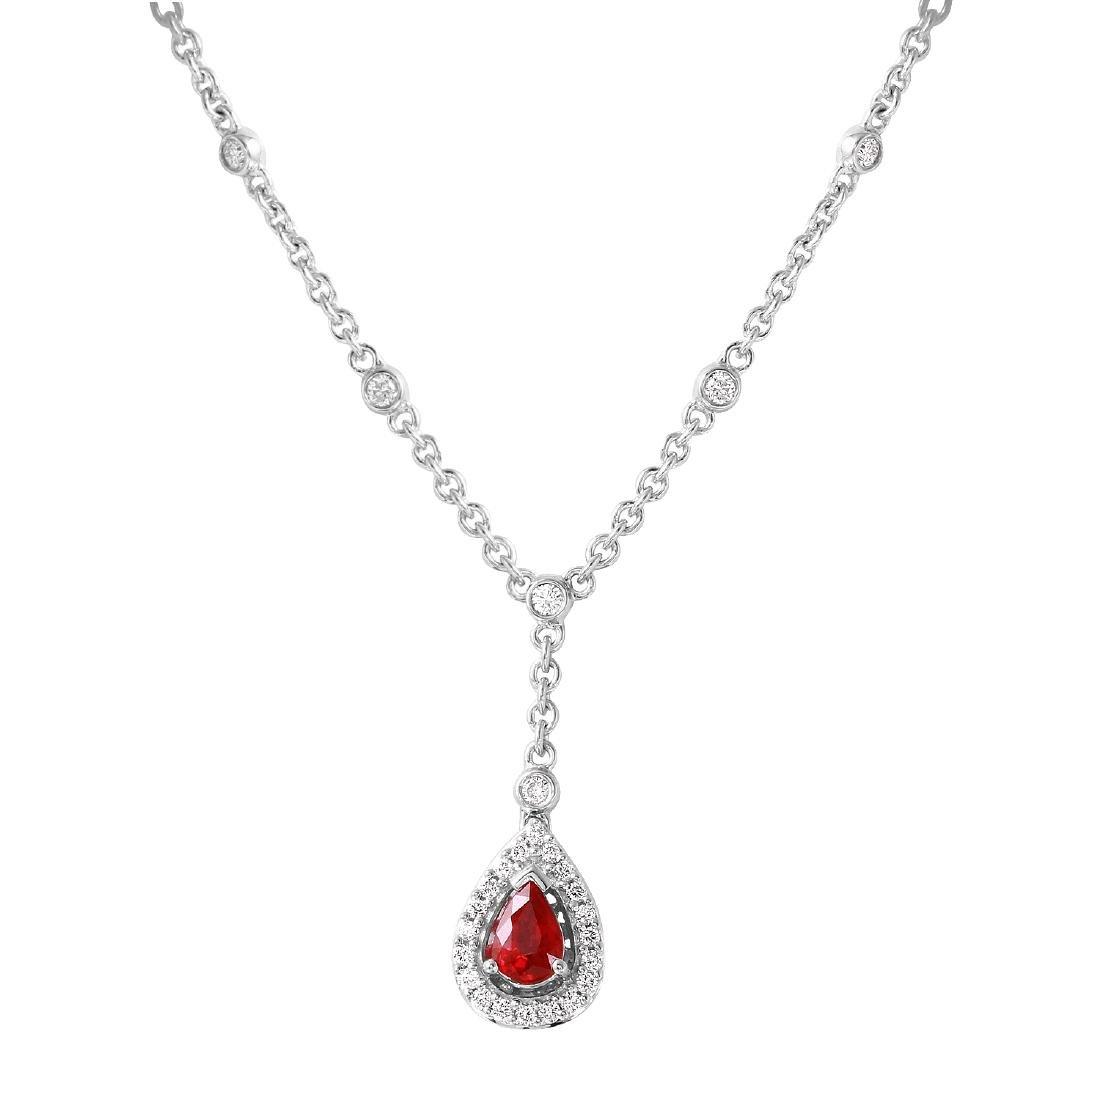 14KT White Gold Ruby & Diamond Necklace